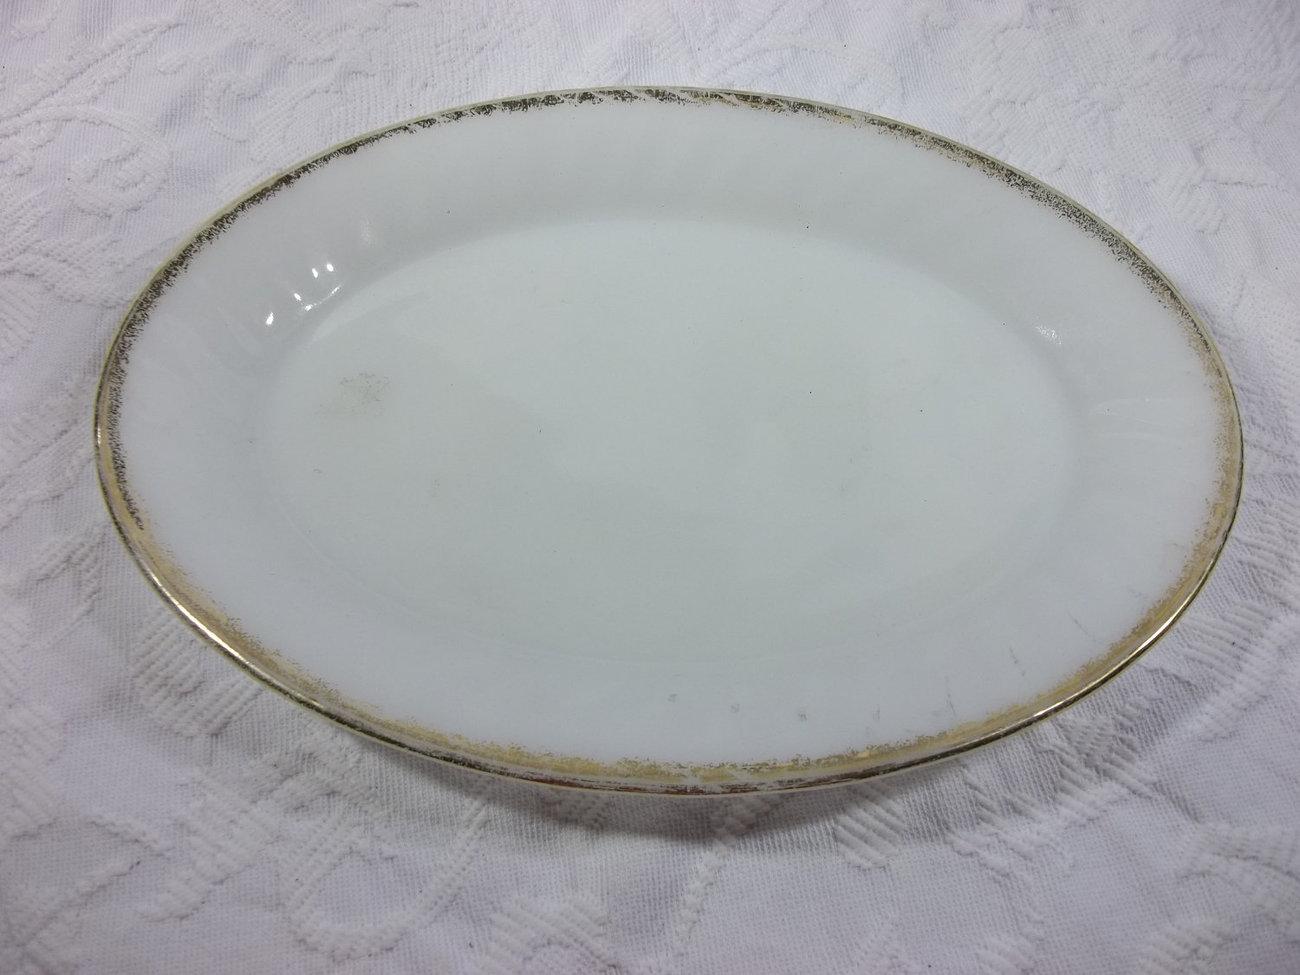 Fire King, Anchor Hocking Milk Glass Serving Platter, Gold Rim - $10.00